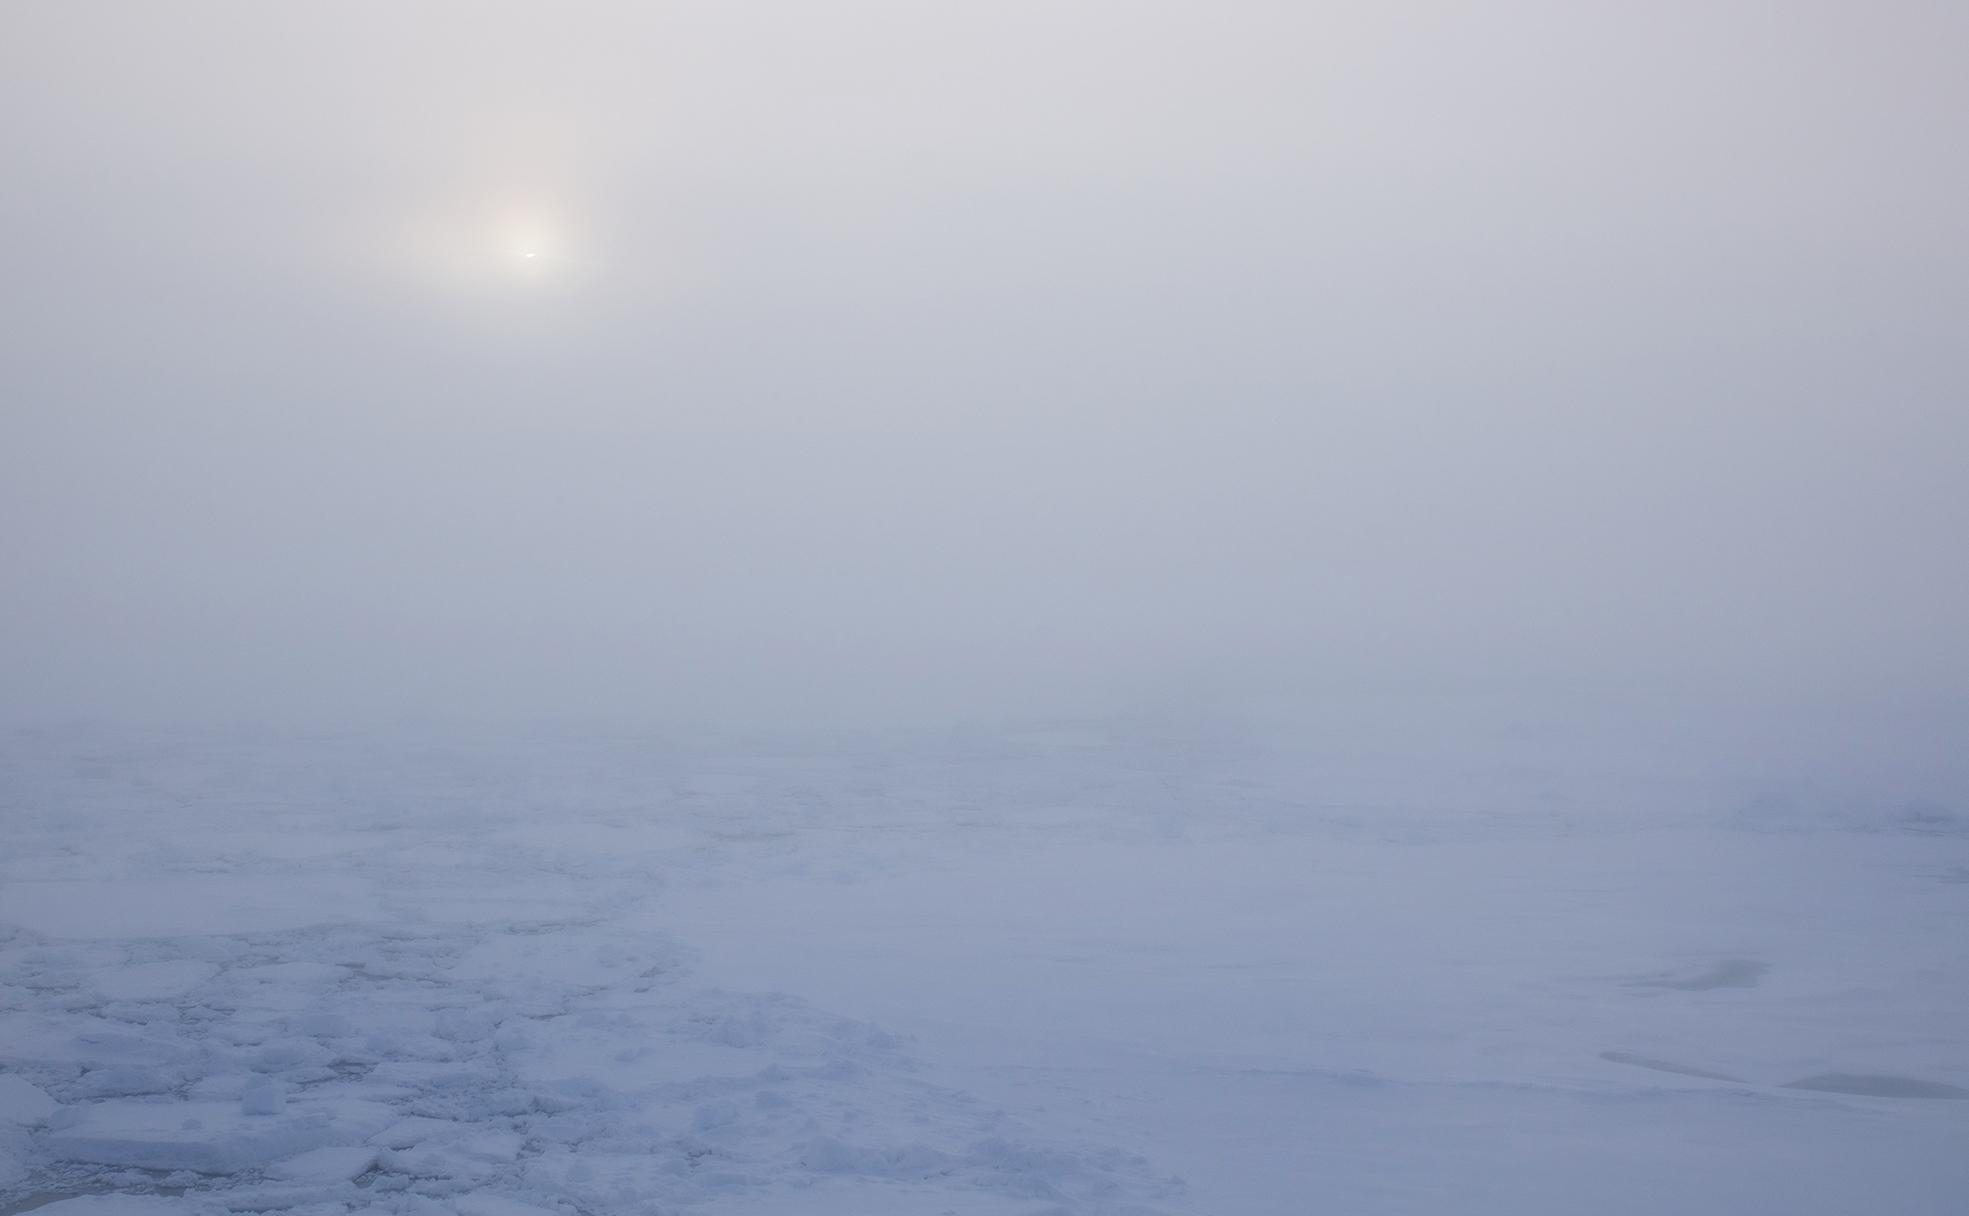 Arktisk dimma 6 september 2018. Foto: Patrick Duplessis